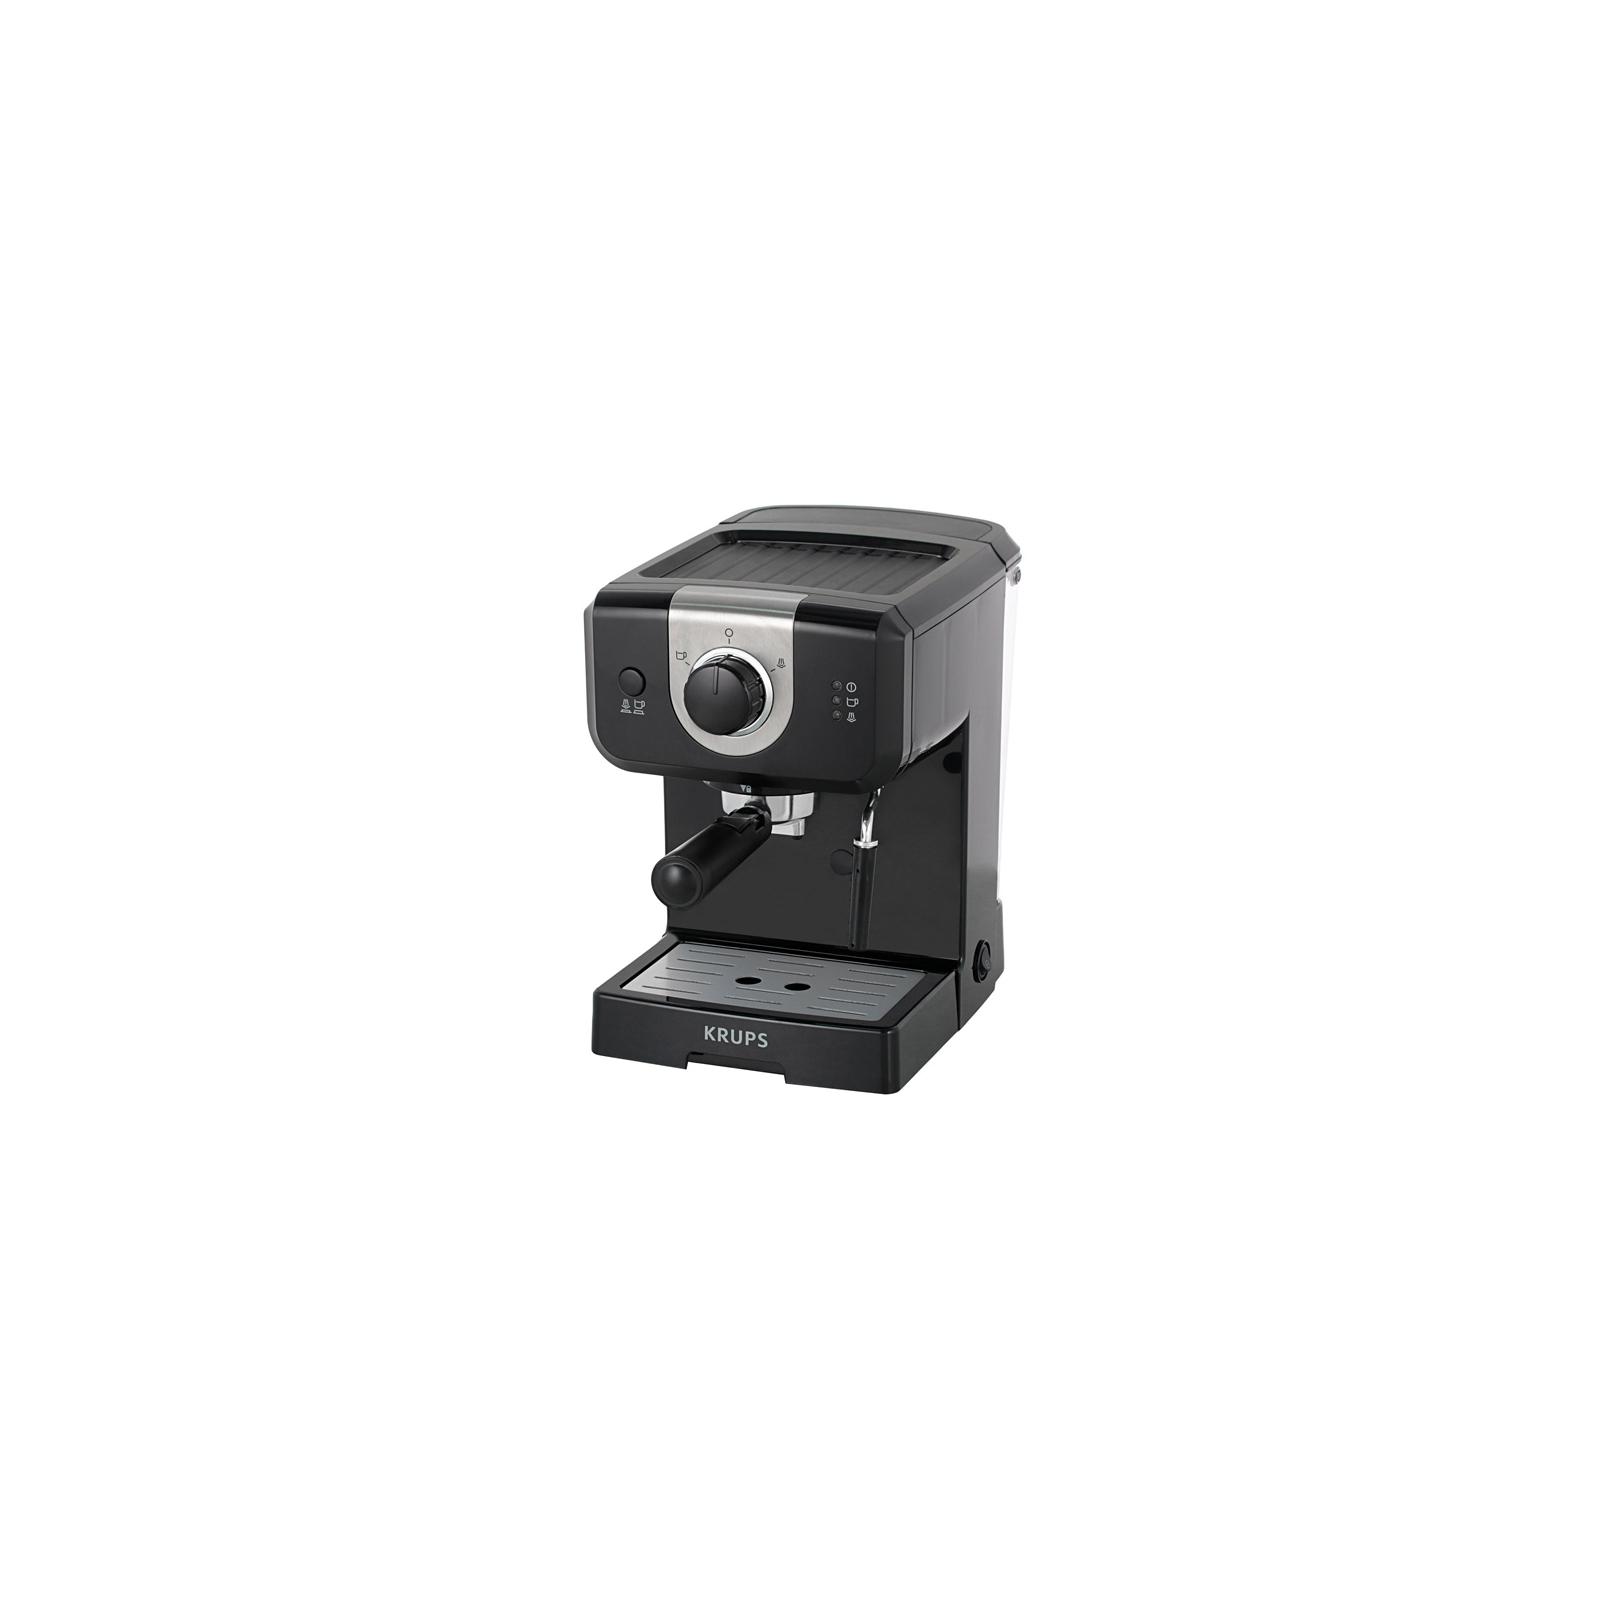 Кофеварка Krups XP320830